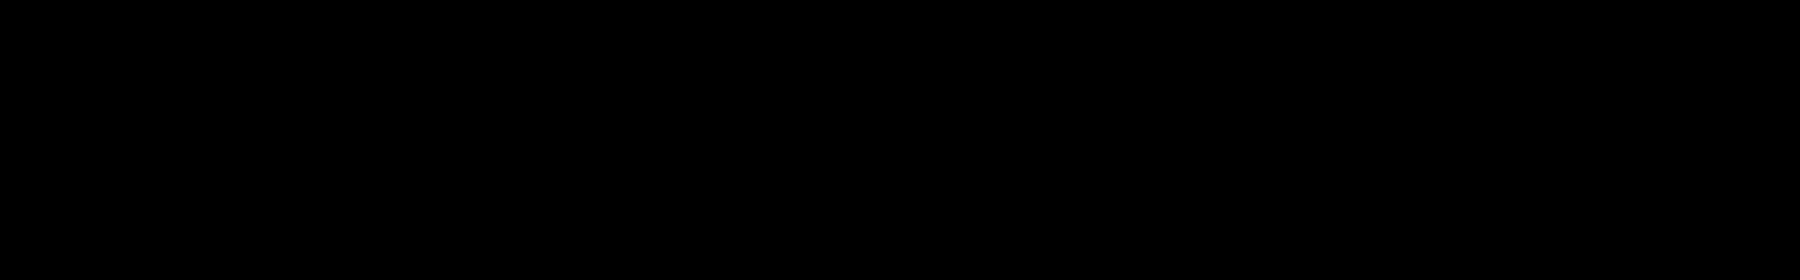 Lo-Fi audio waveform